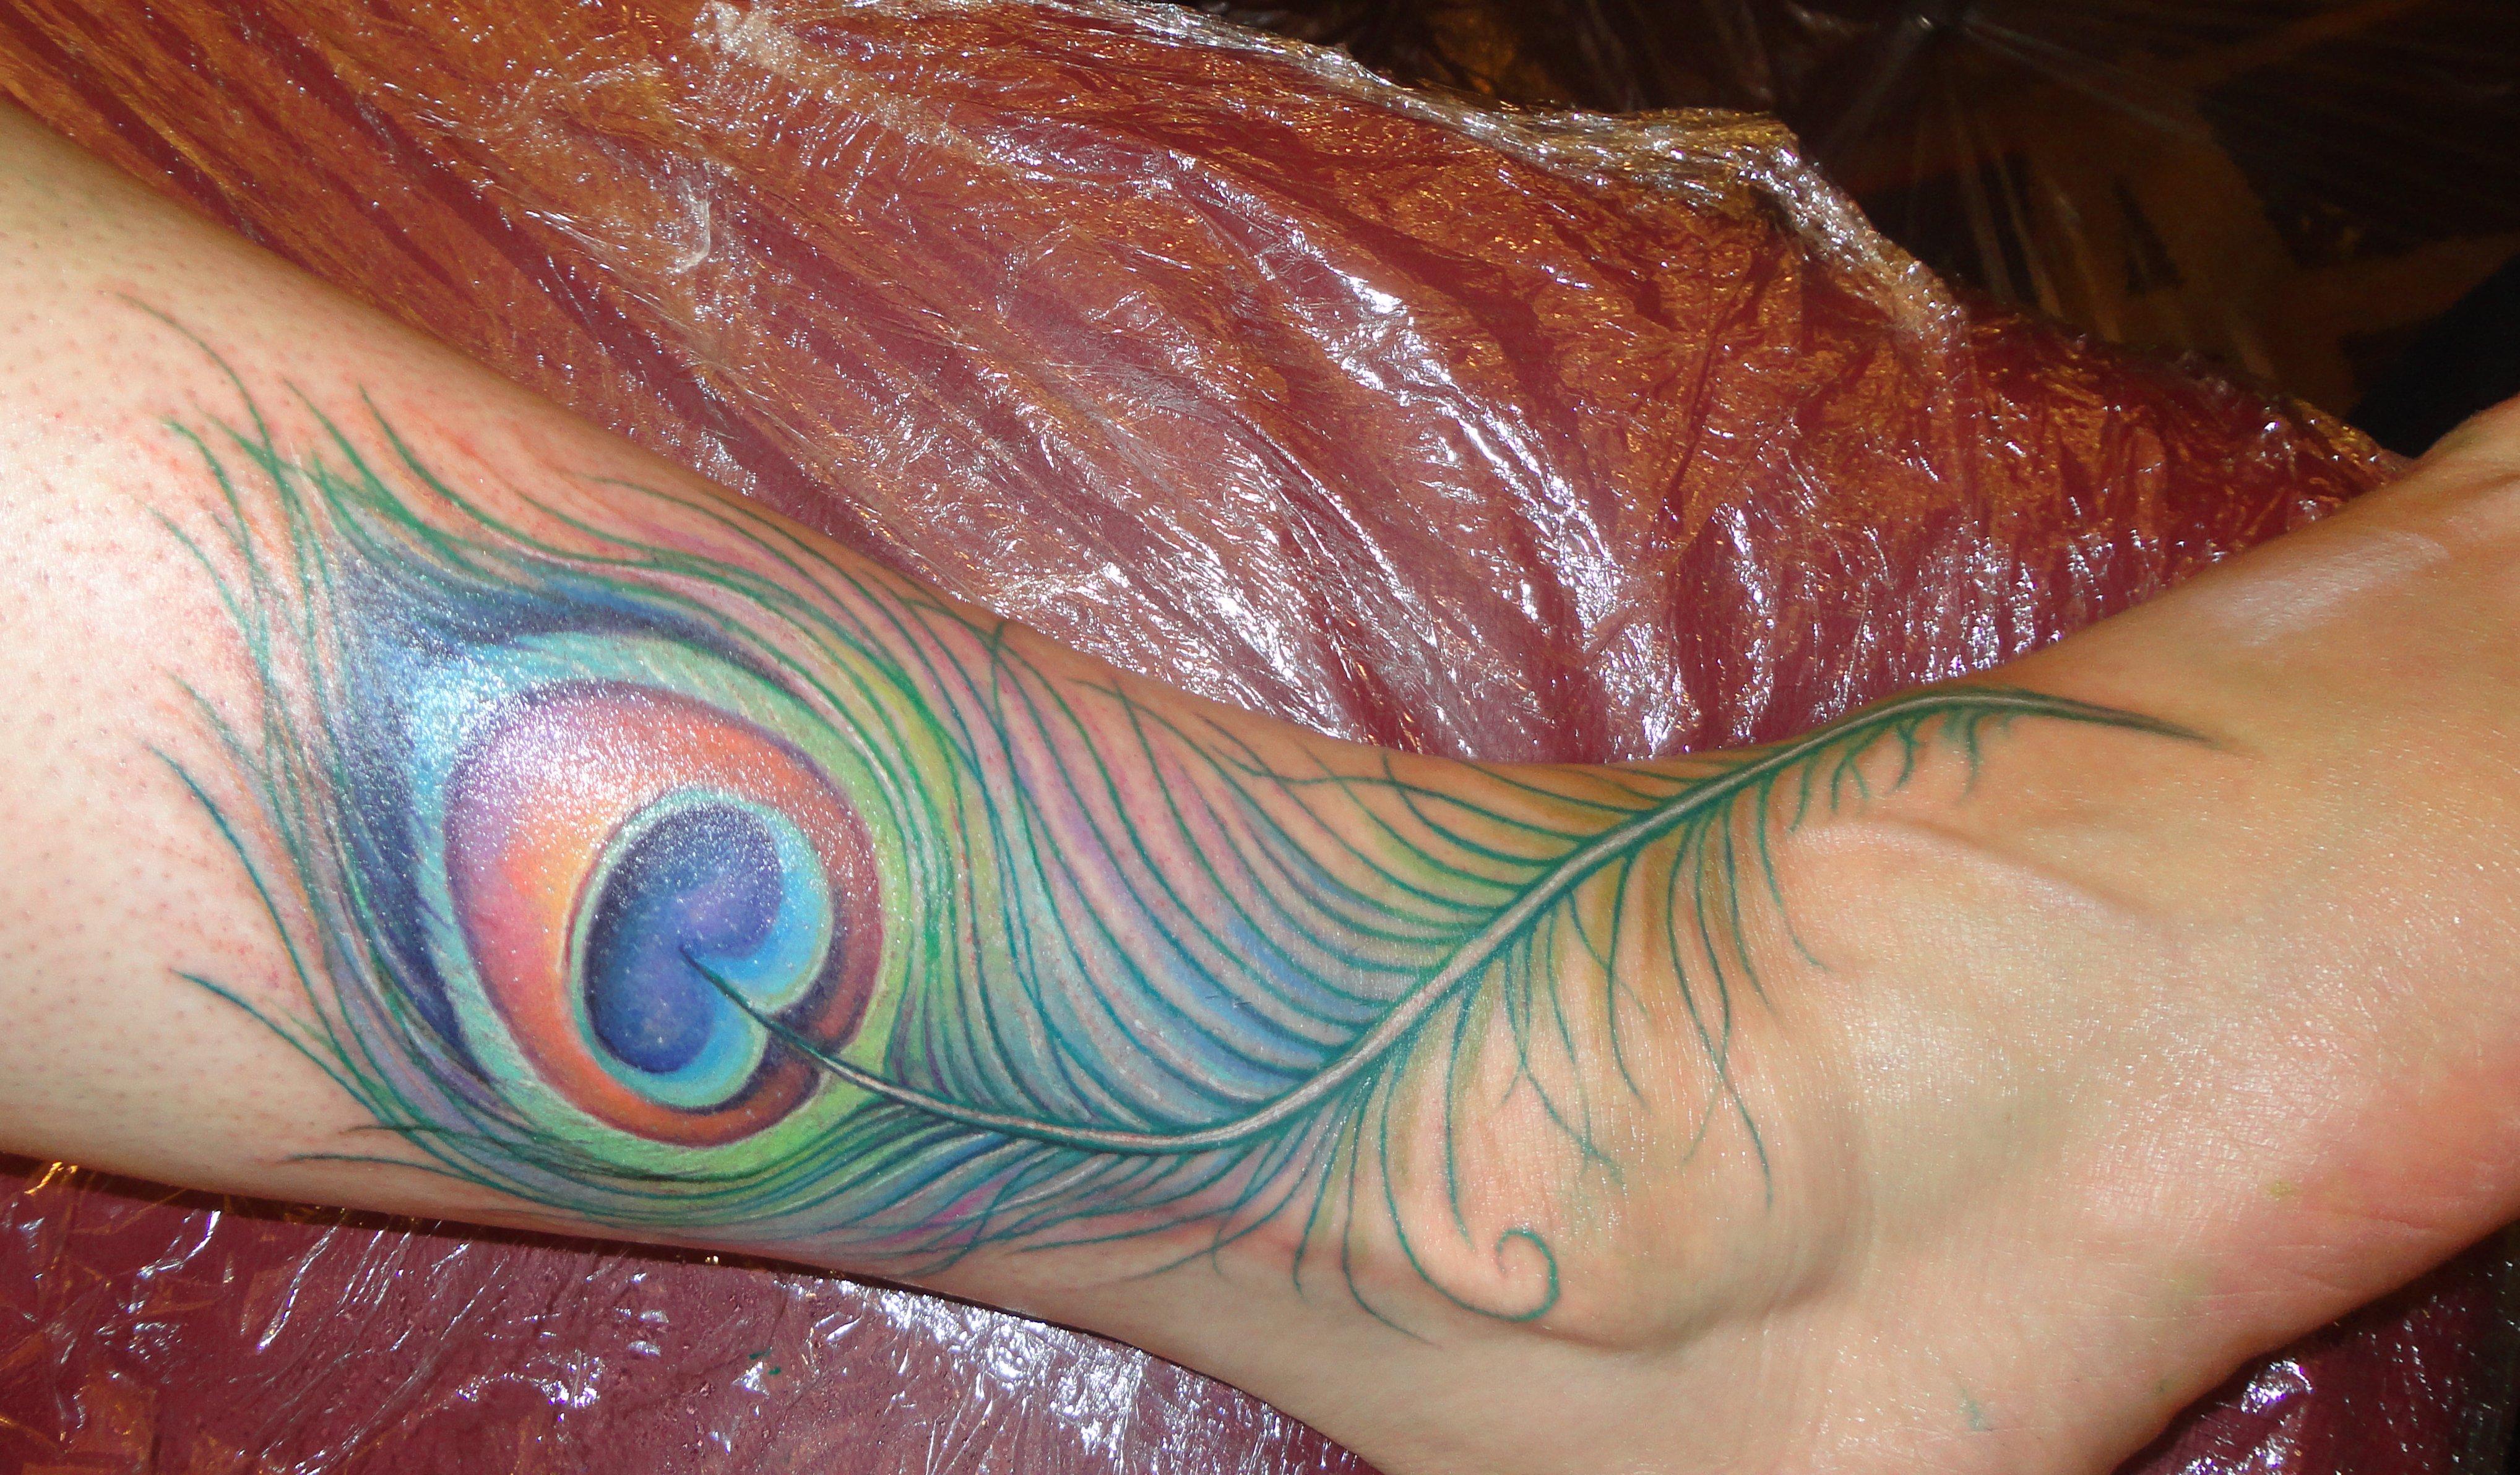 Pfau Tattoo Motive und Pfauenfeder Tattoo Bedeutung alletattoo.de 28